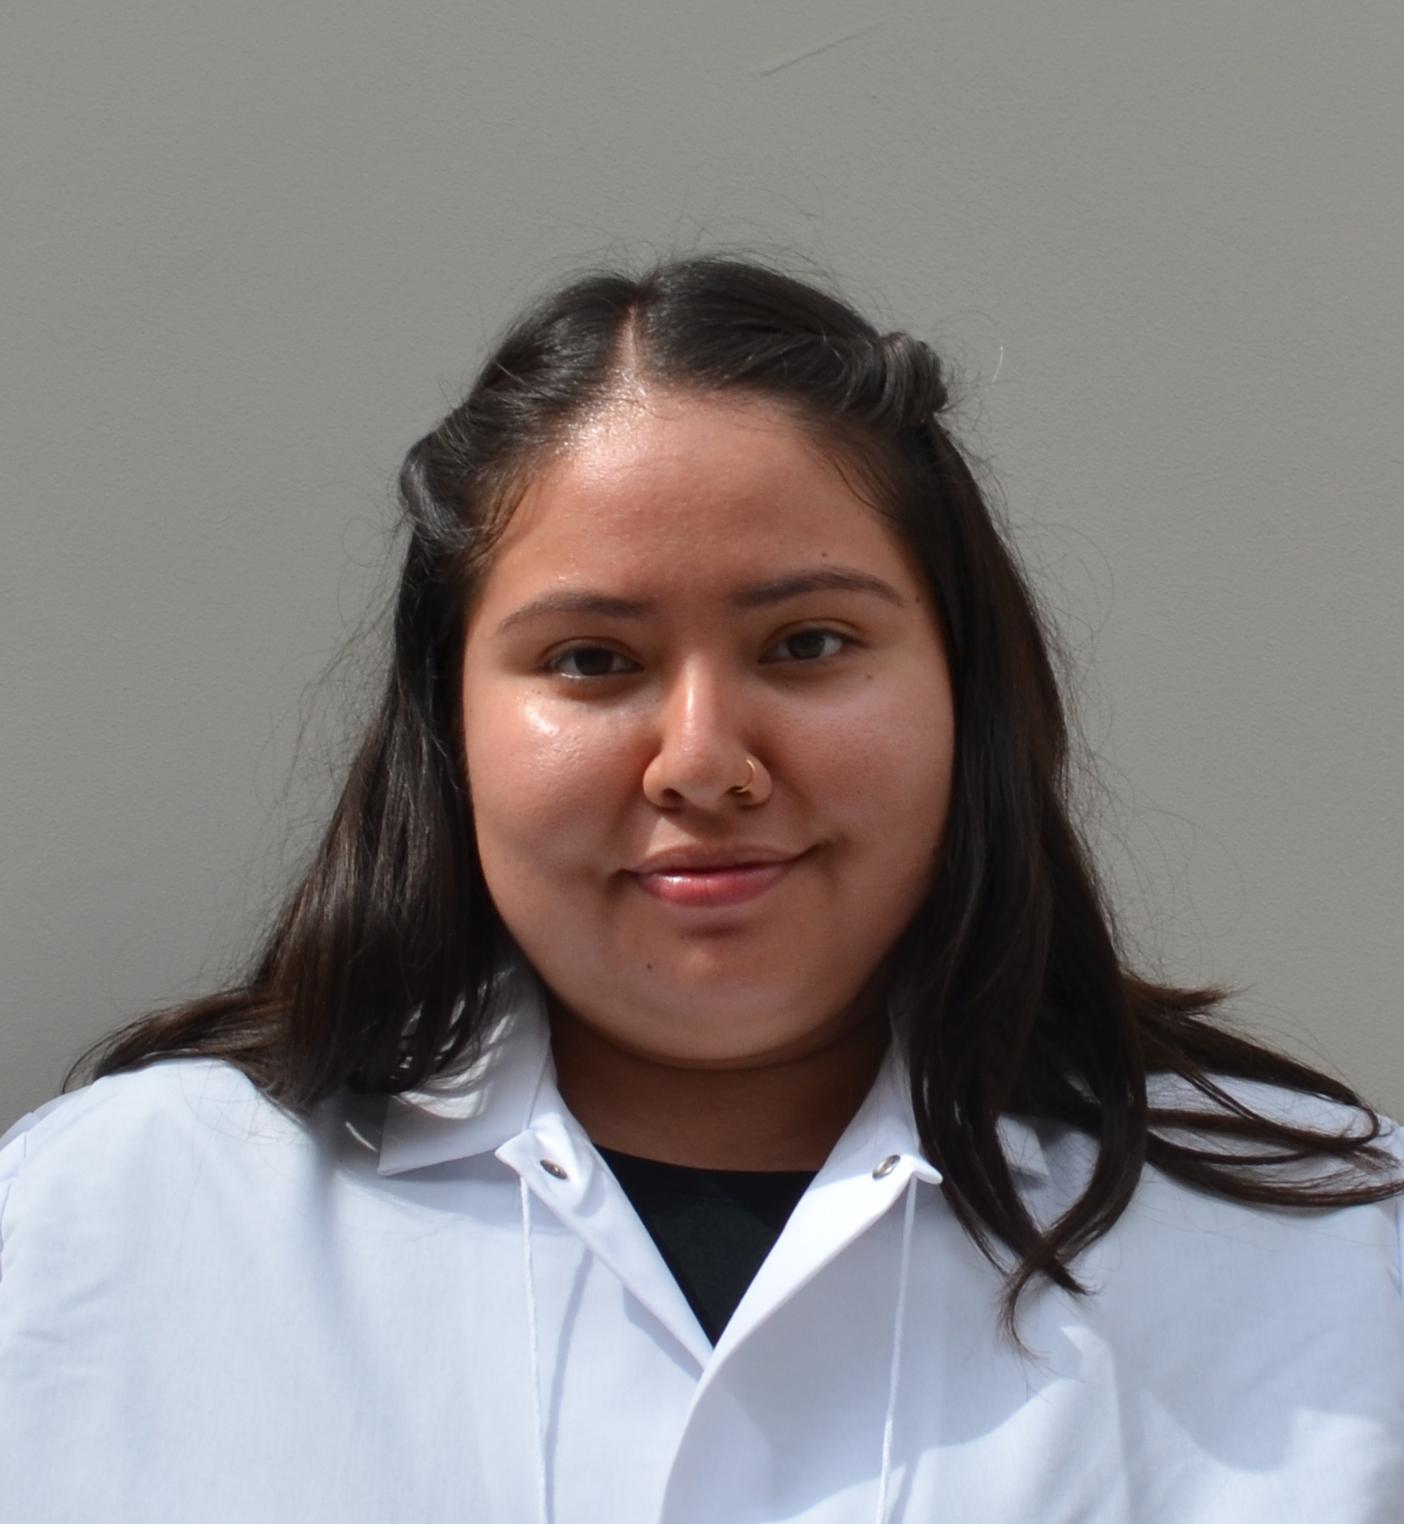 Yesenia Duarte